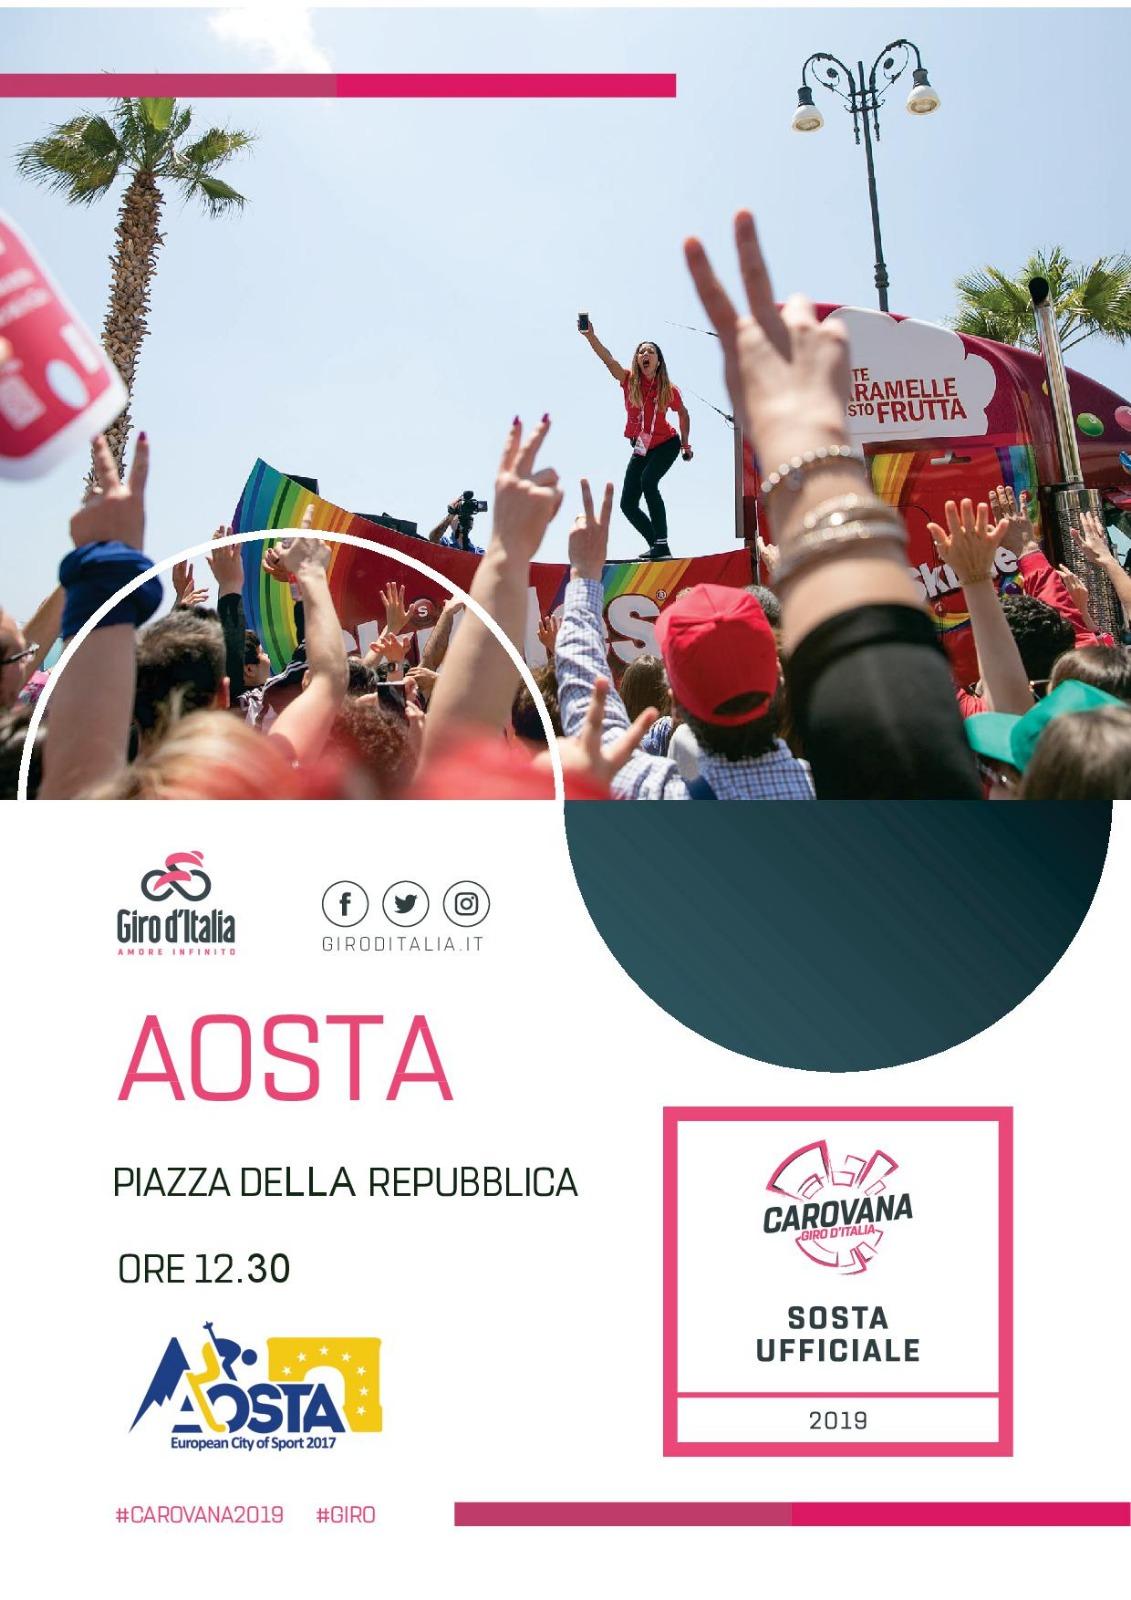 Aosta-Giro d'Italia